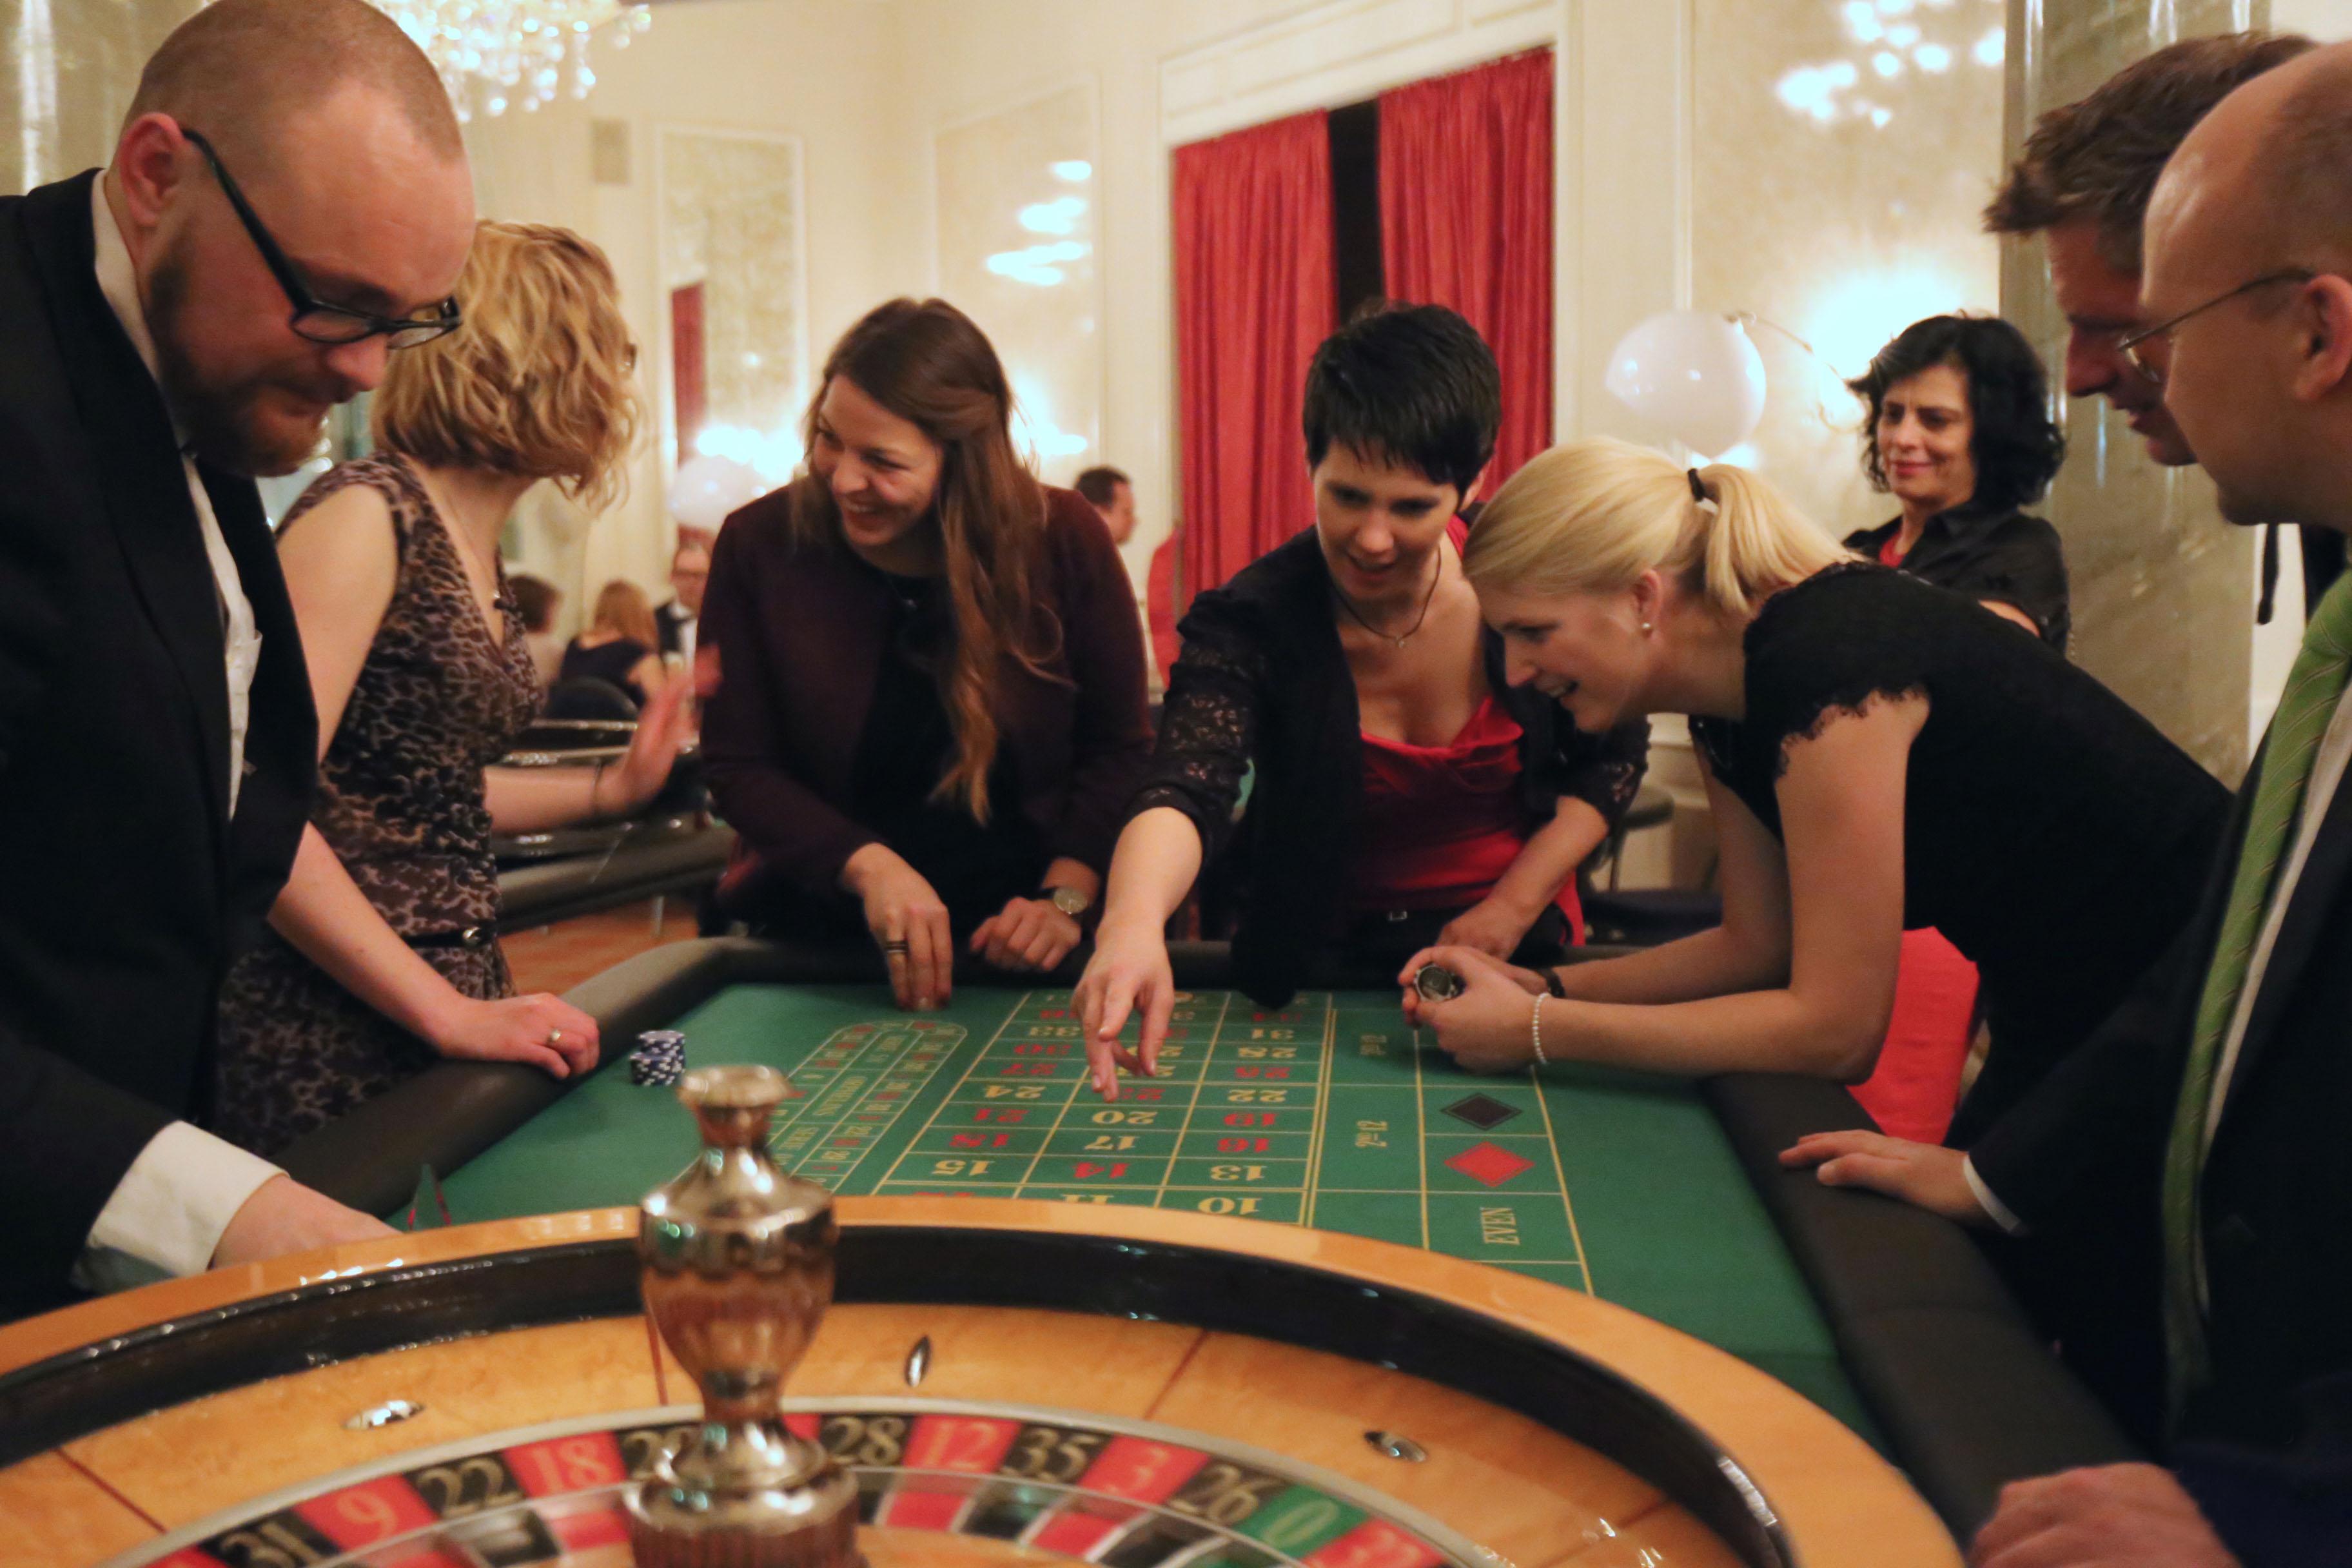 Amerikanisches Roulette: Casino Equipment mieten